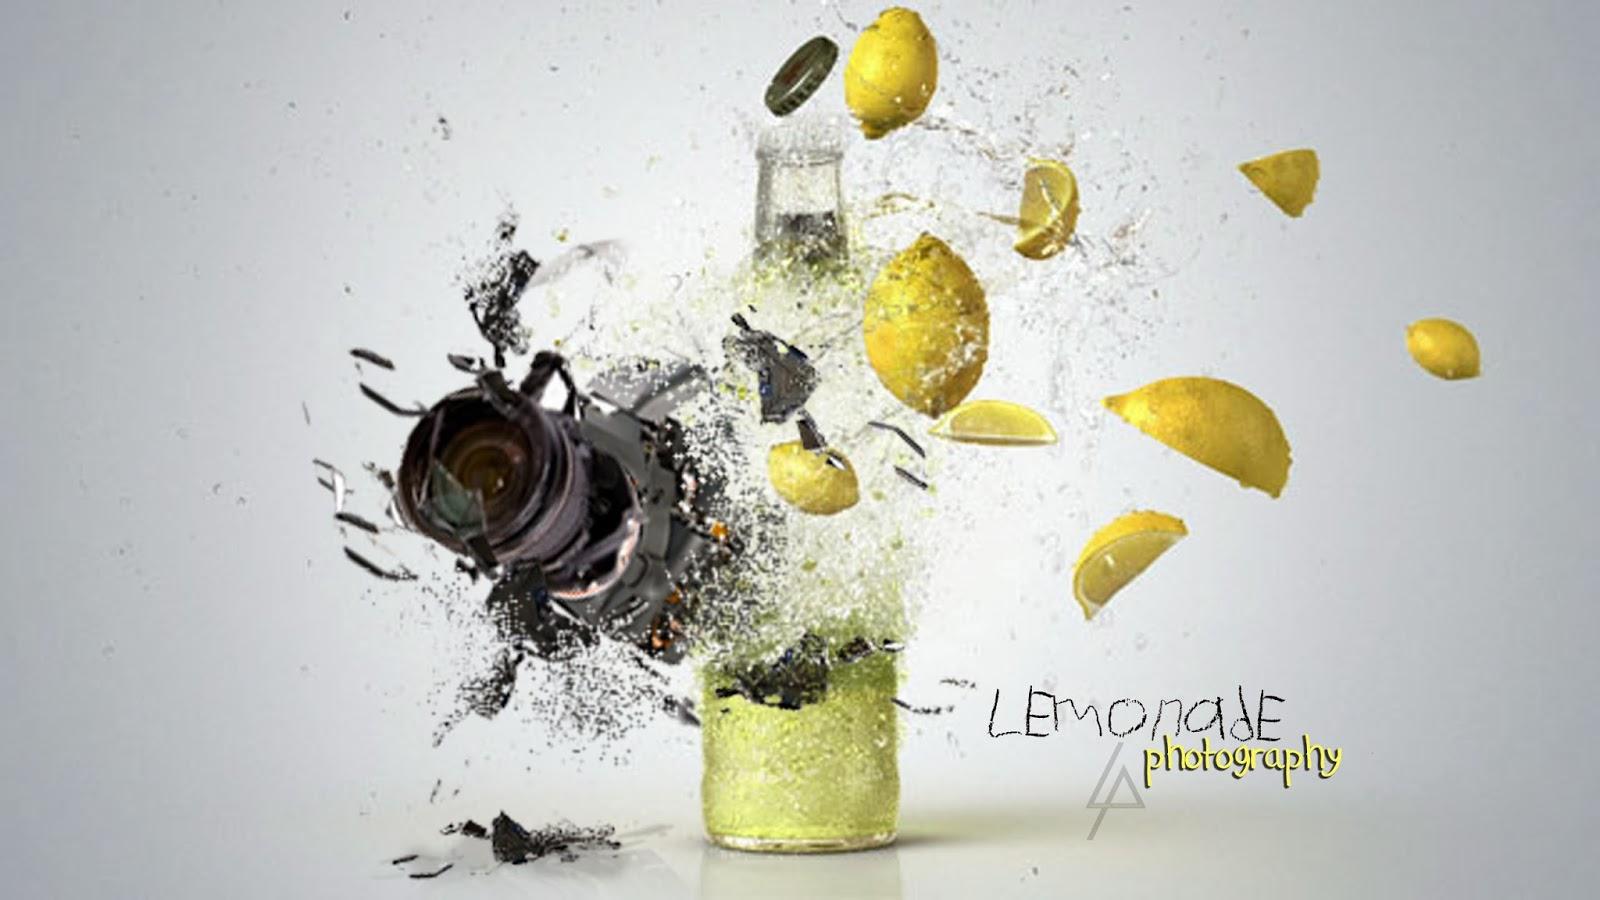 http://lemonade-photography.blogspot.com